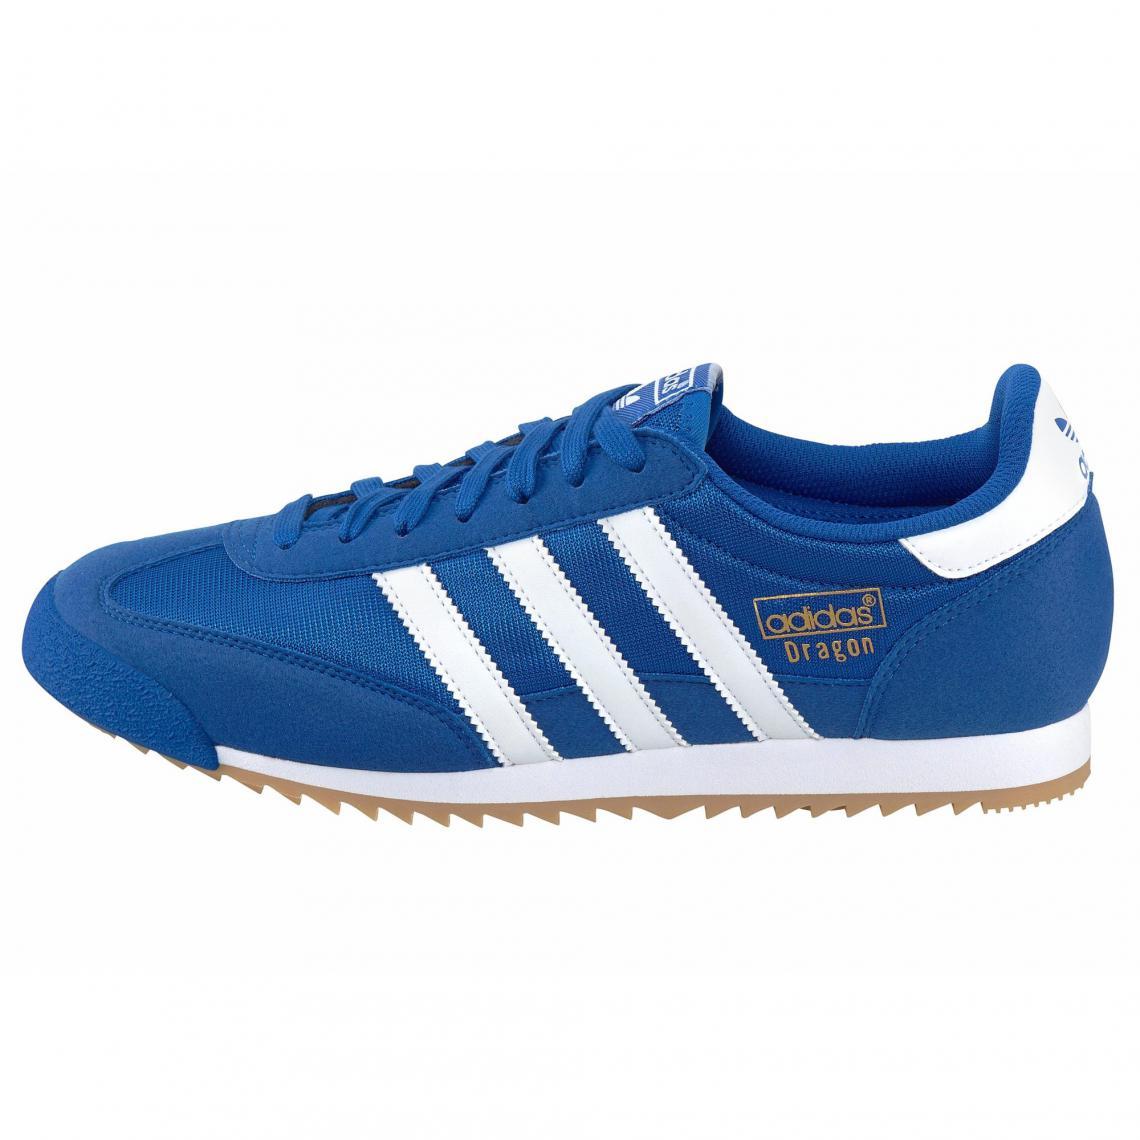 adidas Originals Dragon OG chaussures de running homme adidas ... 19bc19847f34